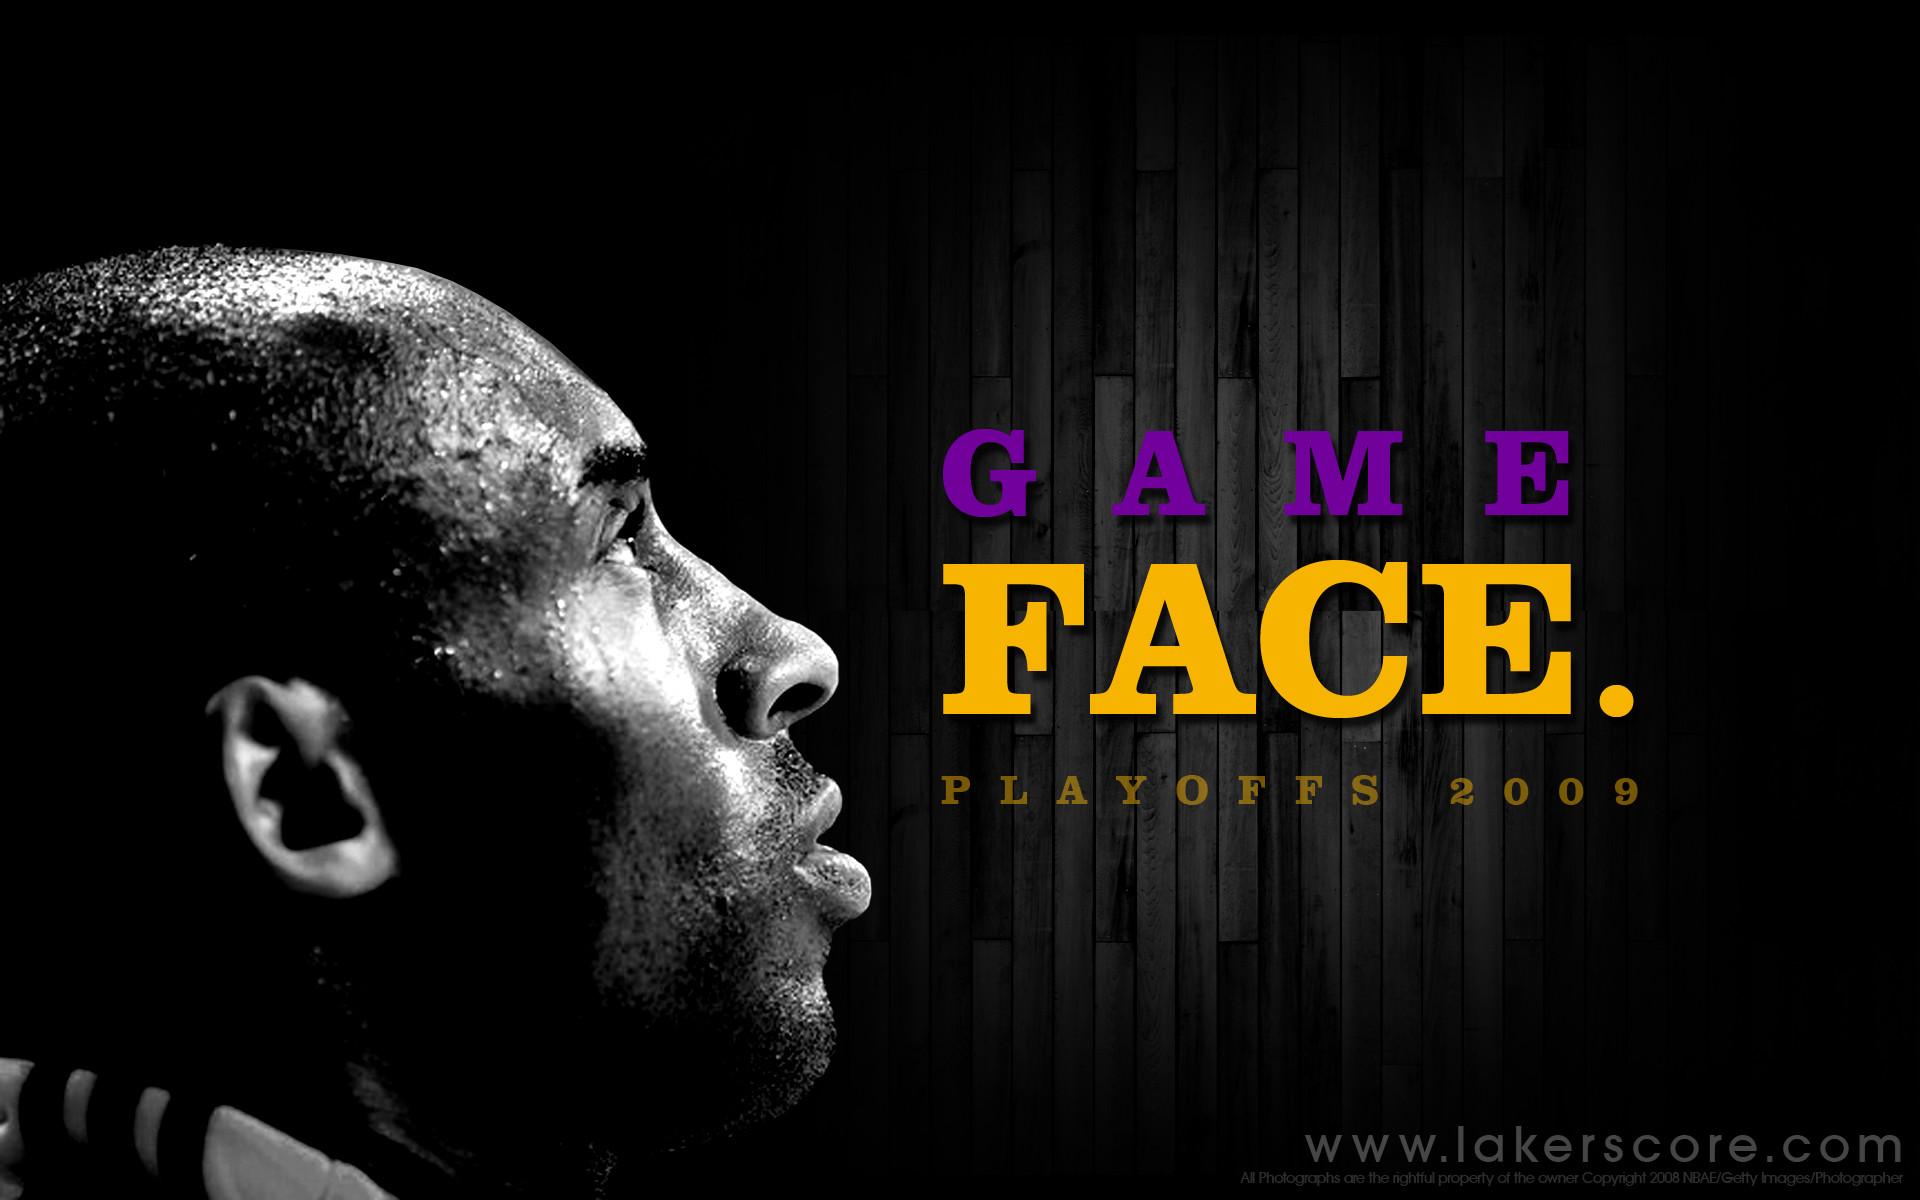 Lakers Wallpaper Game Face – Live Wallpaper HD